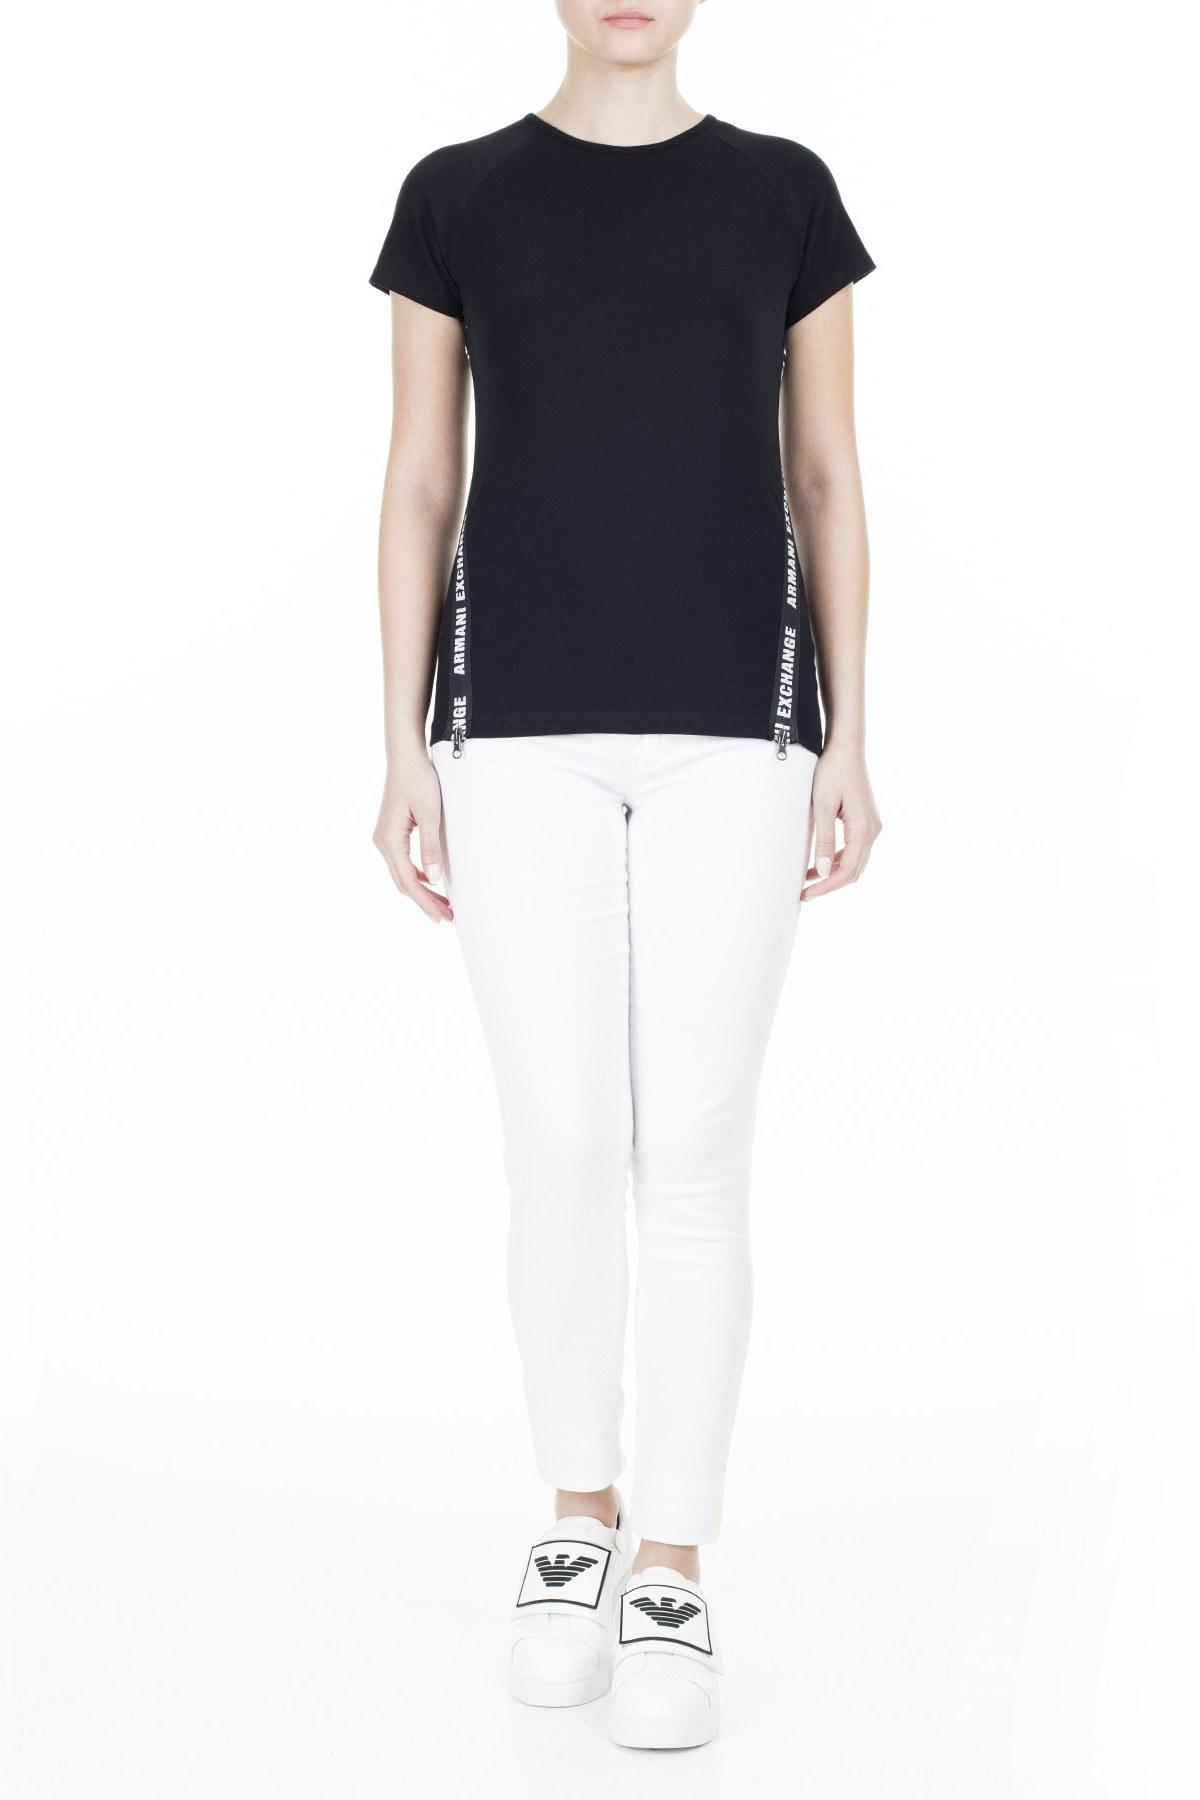 Armani Exchange Kadın T Shirt 3HYMAN YJ90Z 1200 SİYAH